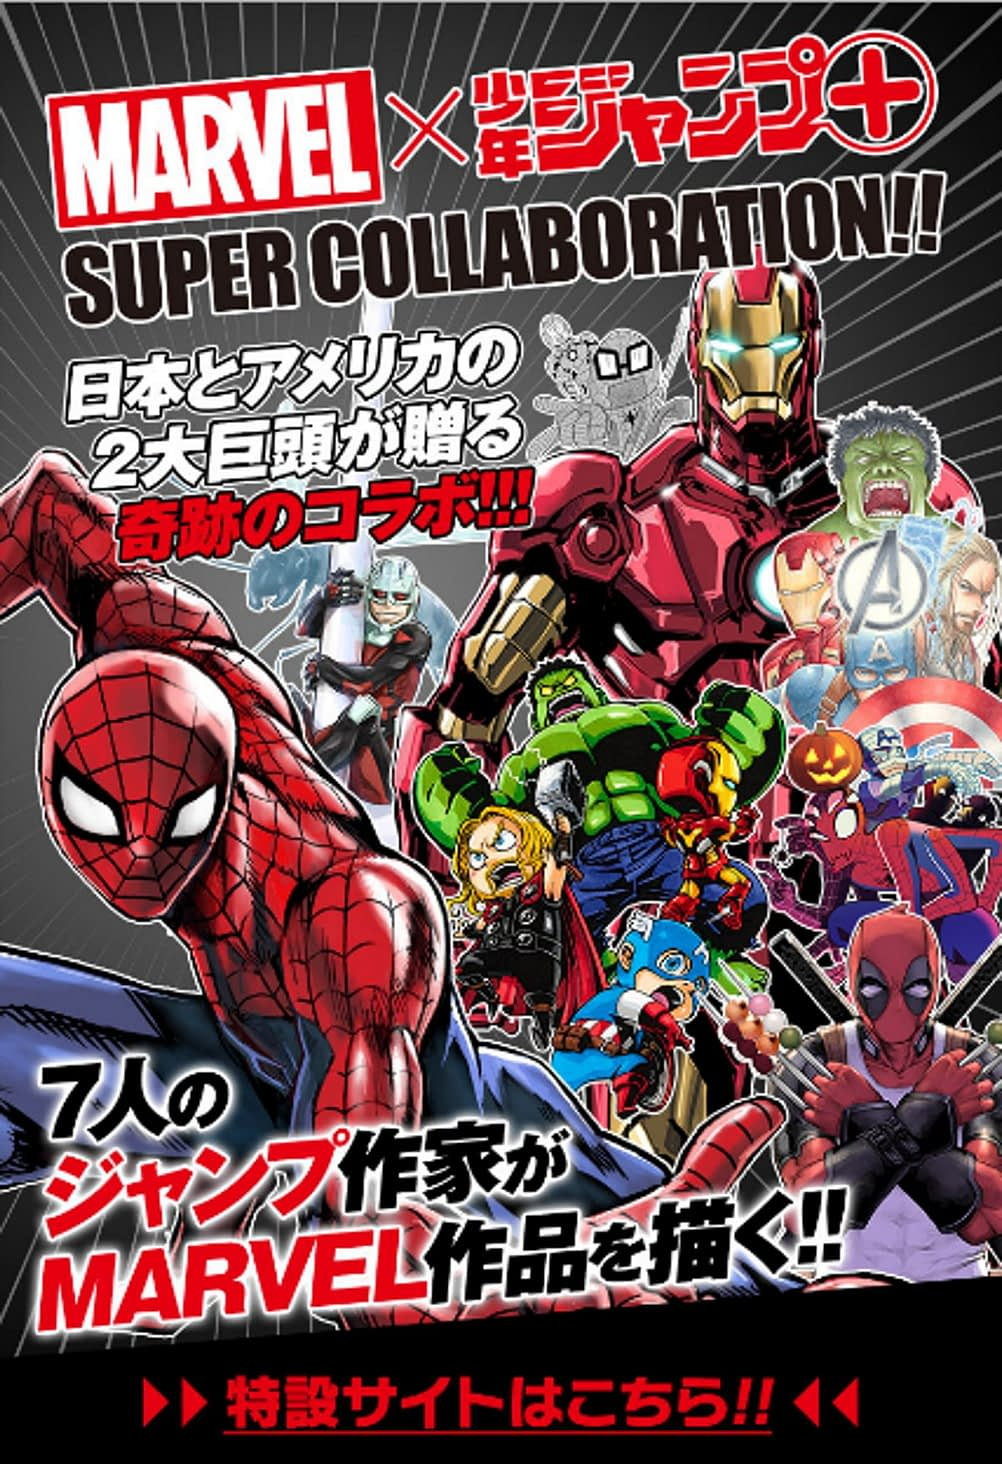 Yu-Gi-Oh! Creator Kazuki Takahashi Kicks Off New Marvel